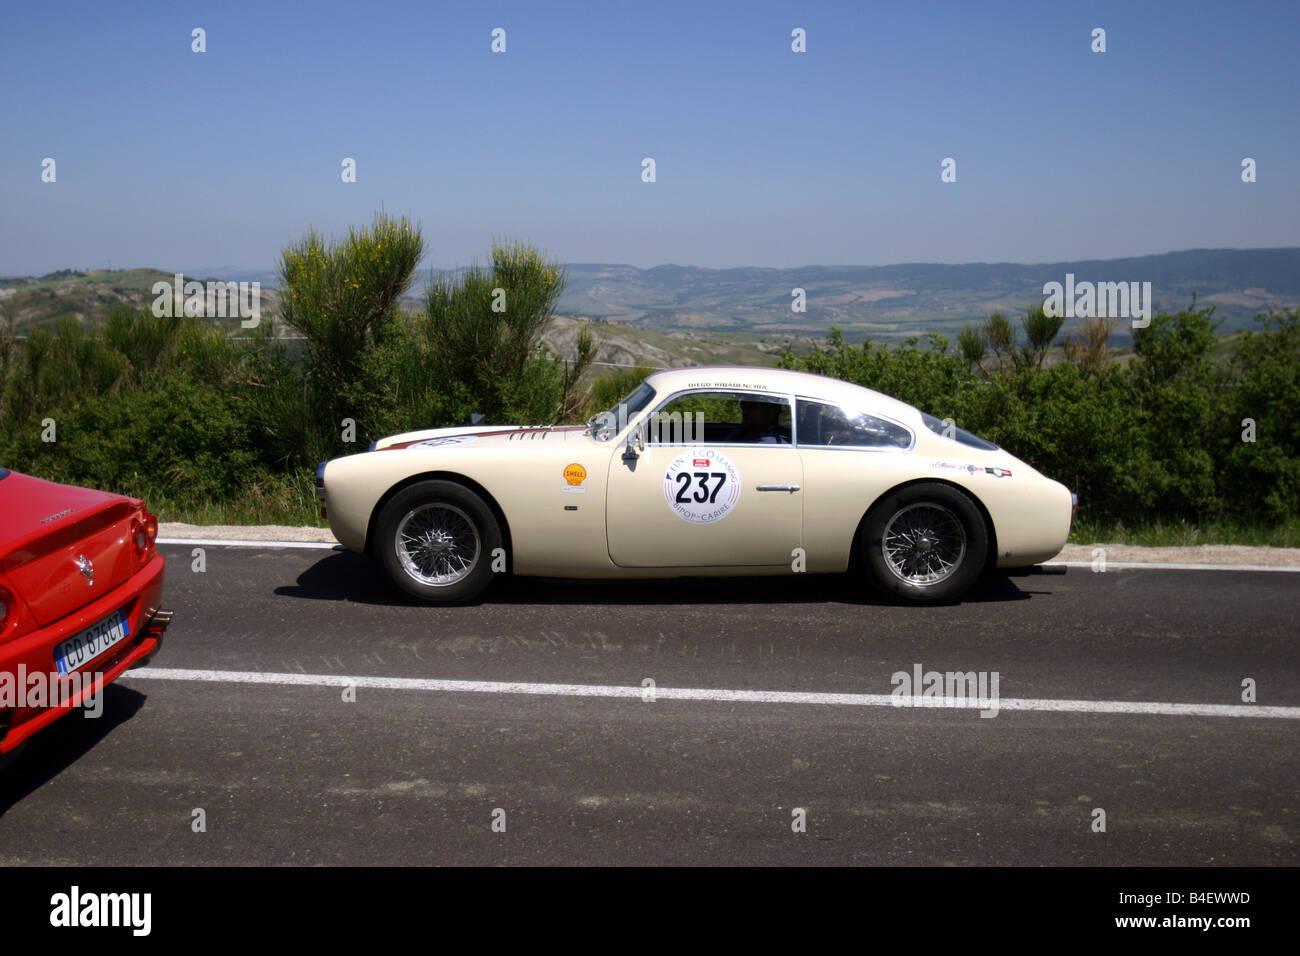 Coche, eventos, evento, vintage car-Rallye, Mille Miglia 2003, paisaje, entorno Imagen De Stock